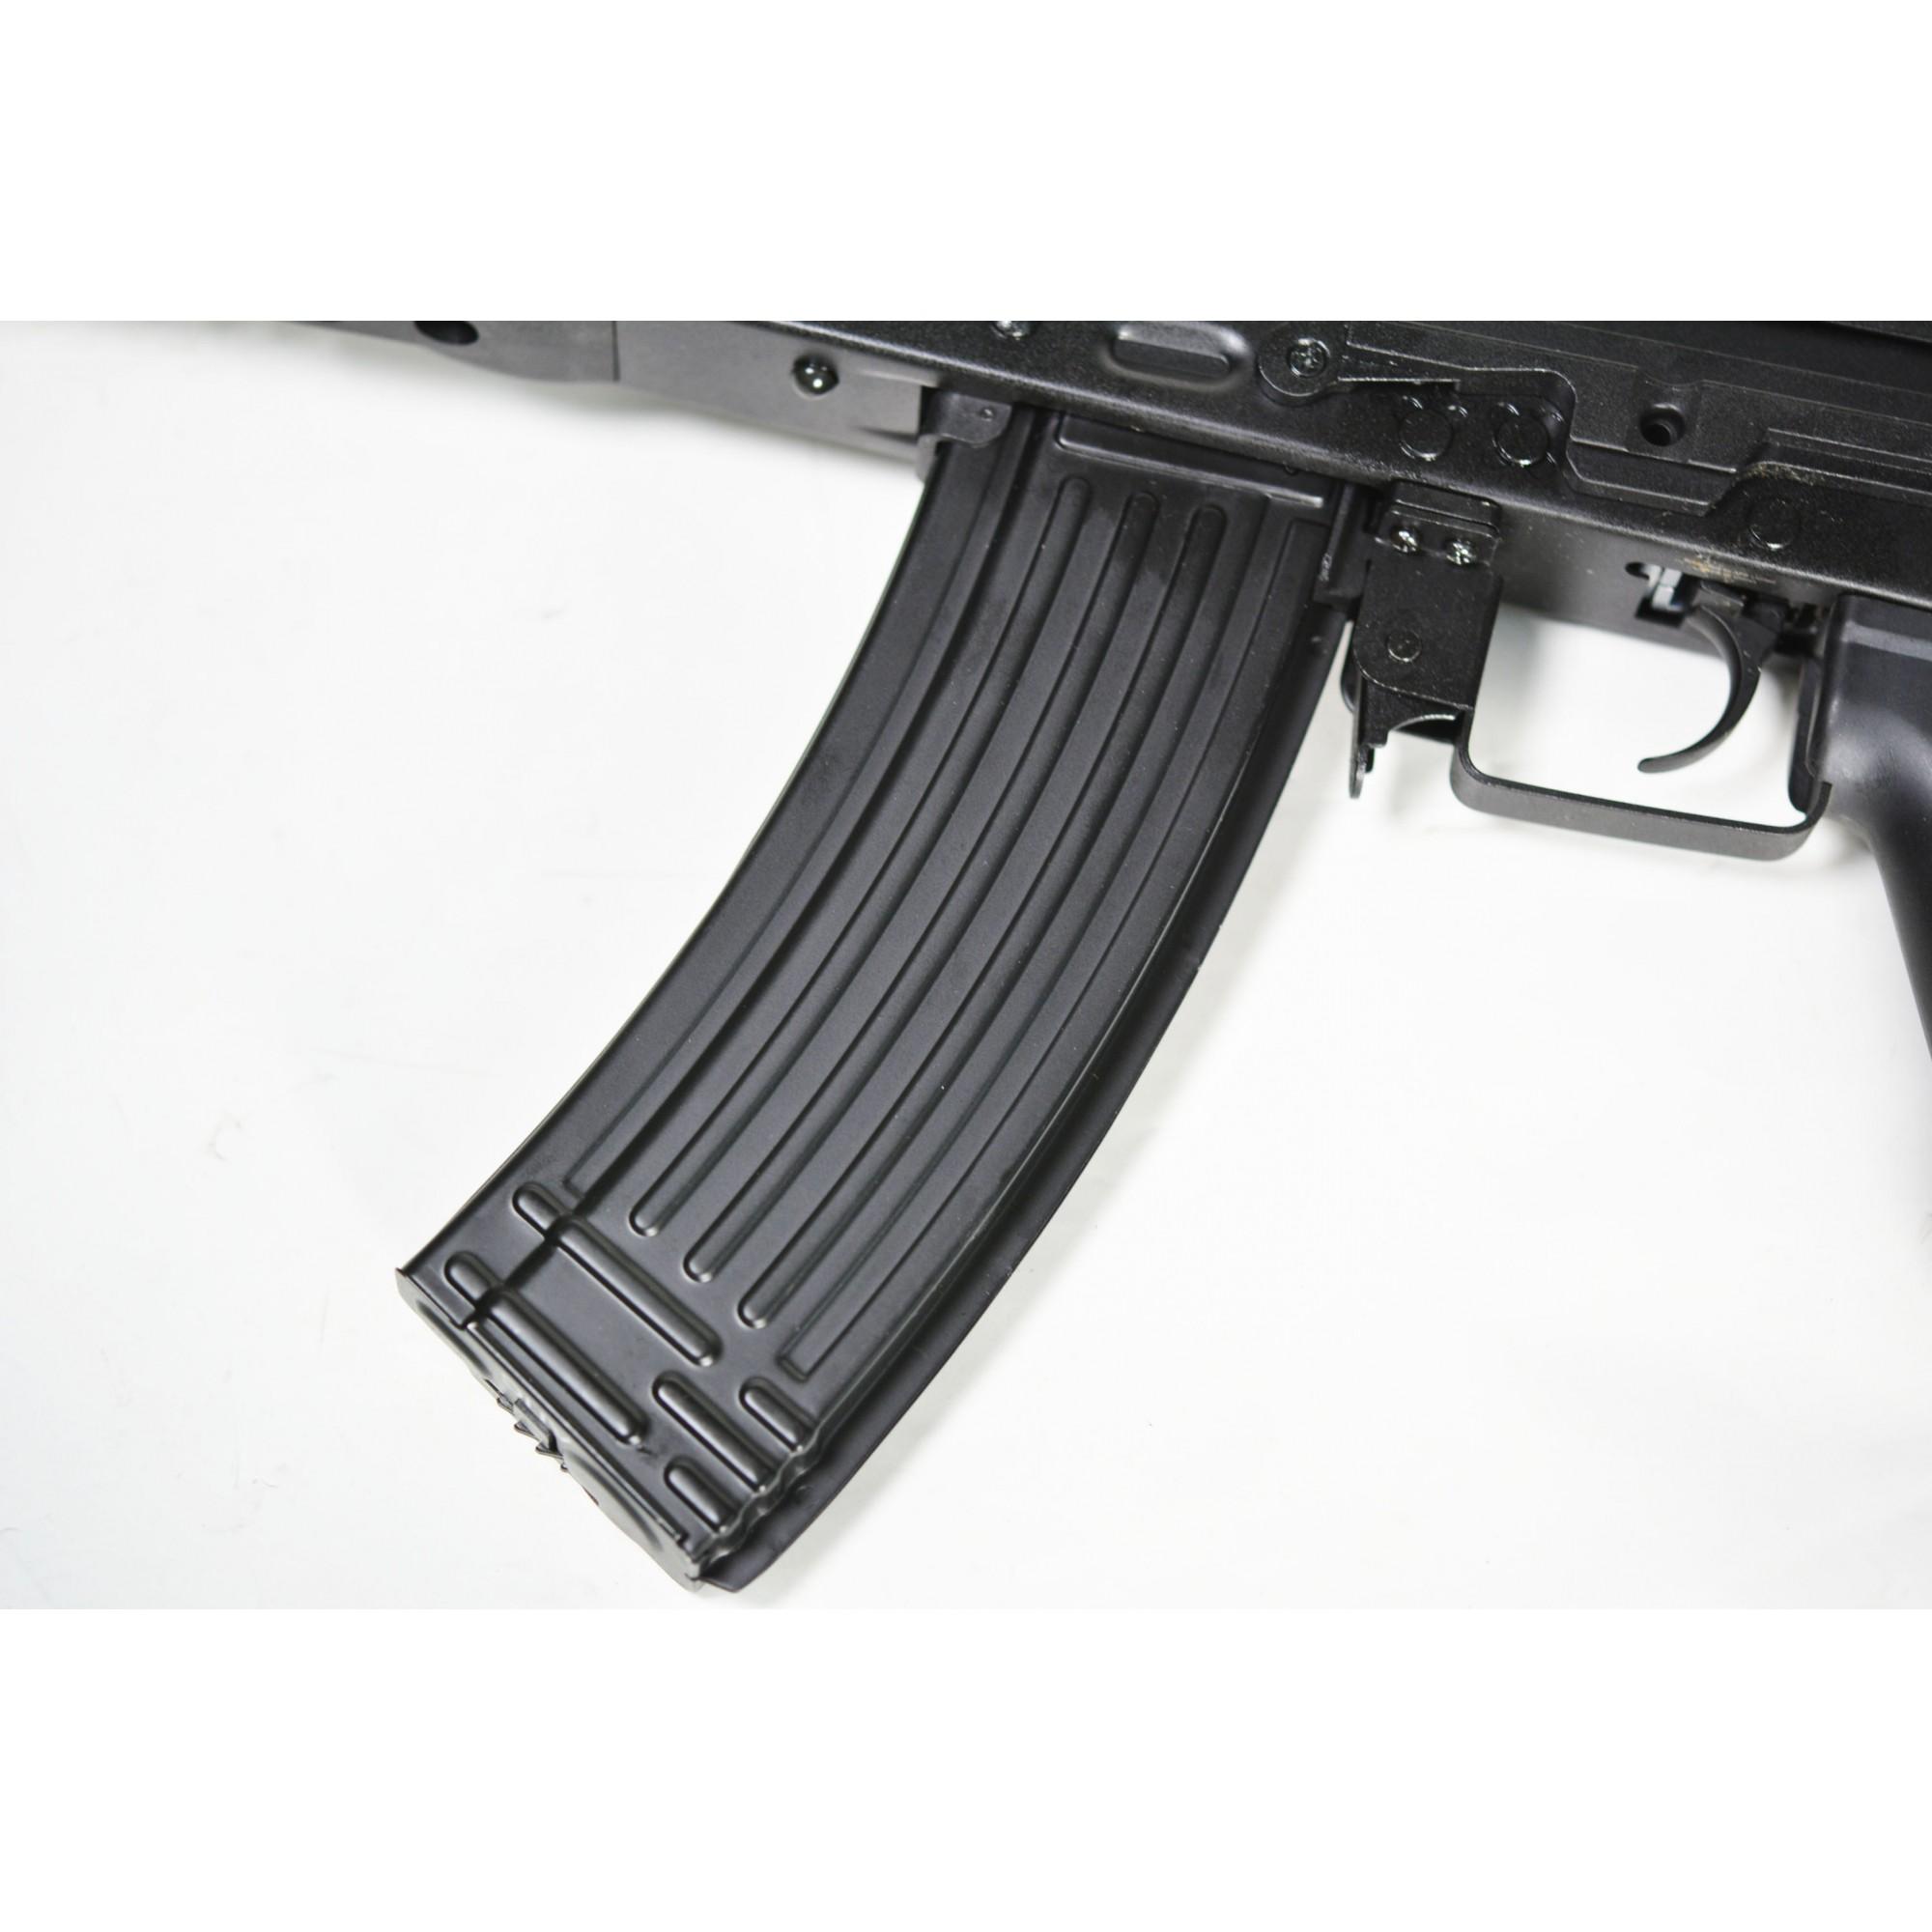 RIFLE DE AIRSOFT AEG TACTICAL AK74 BLACK ASK204P - APS